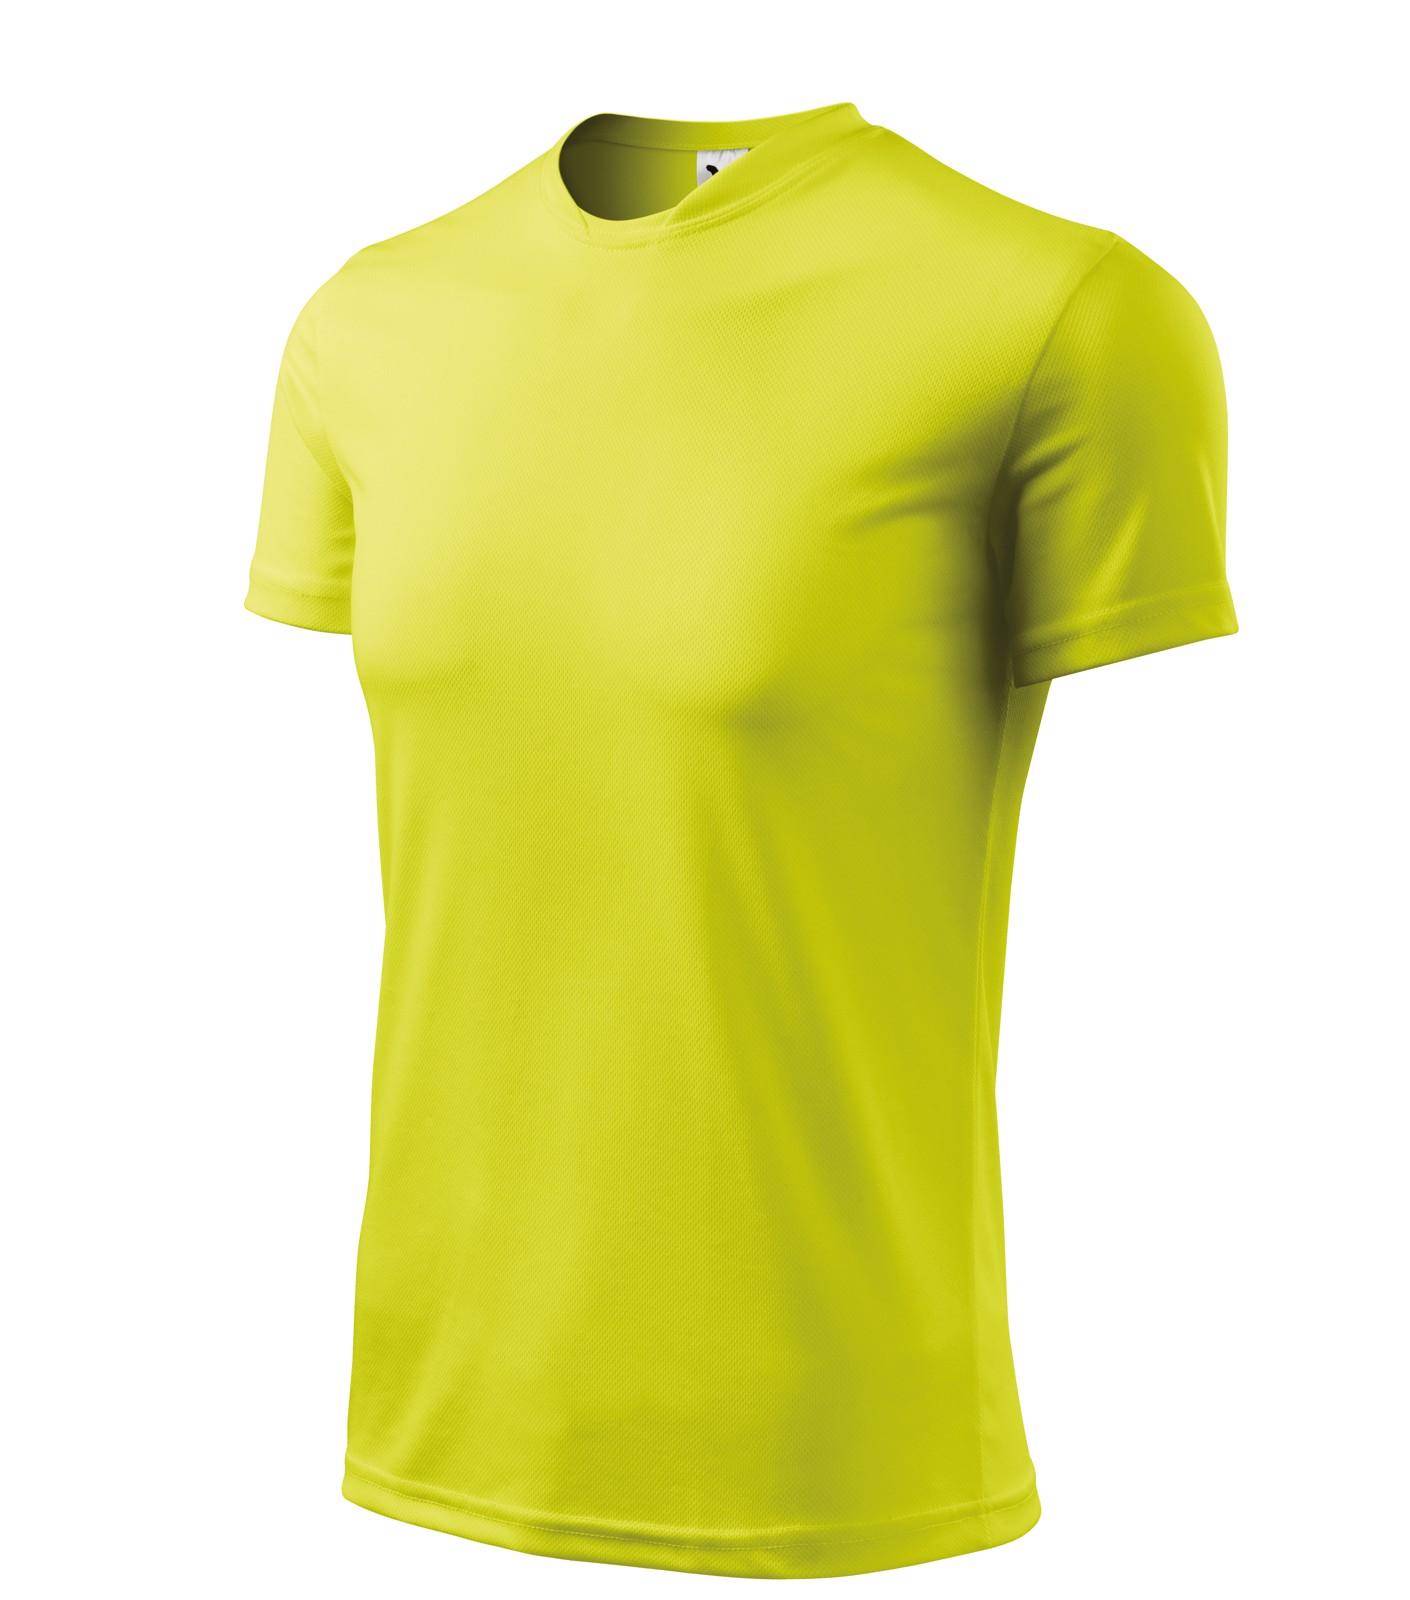 Tričko pánské Malfini Fantasy - Neon Yellow / XS